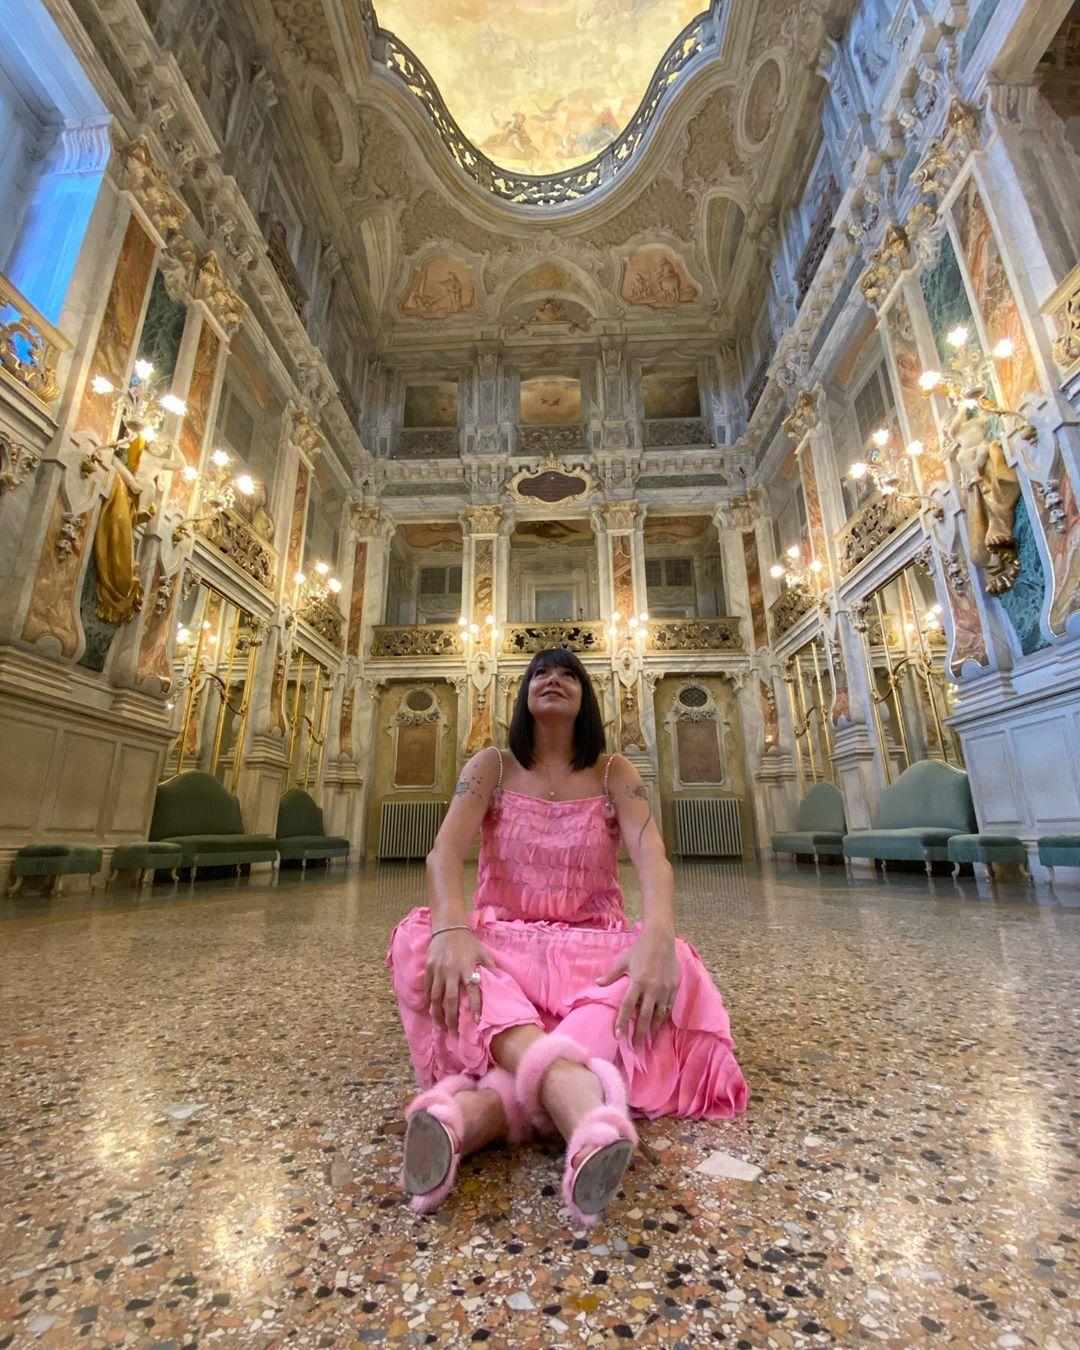 Cristina Fogazzi, la famosa Estetista Cinica